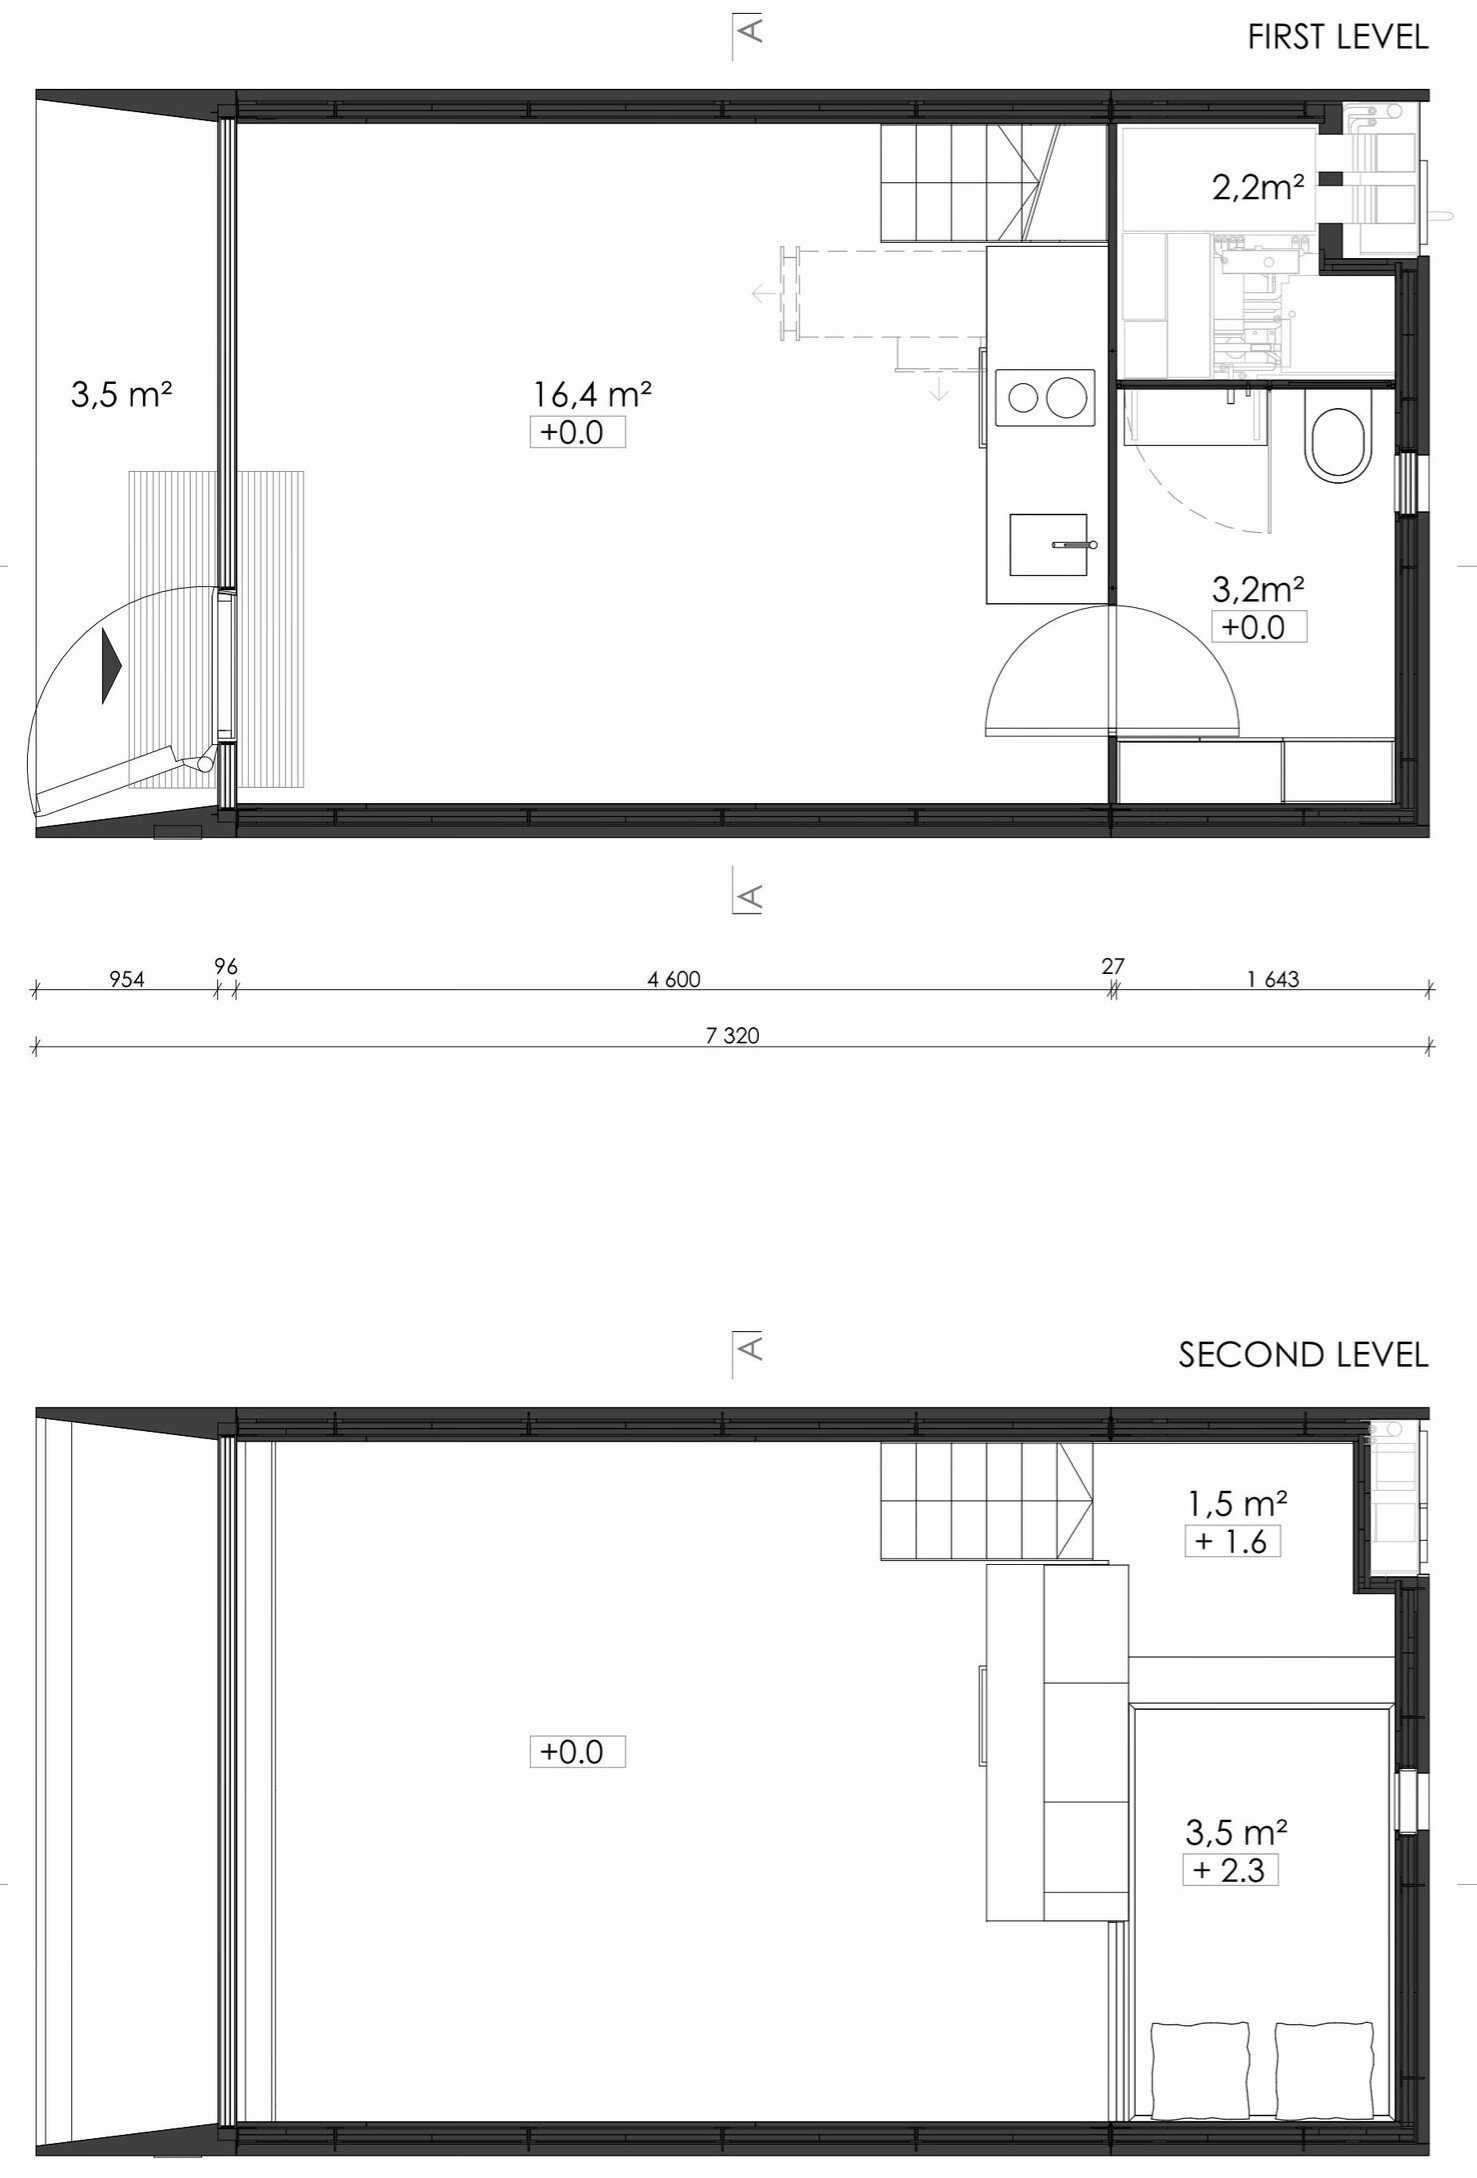 KODA - Kodasema - Estonia - Floor Plans - Humble Homes